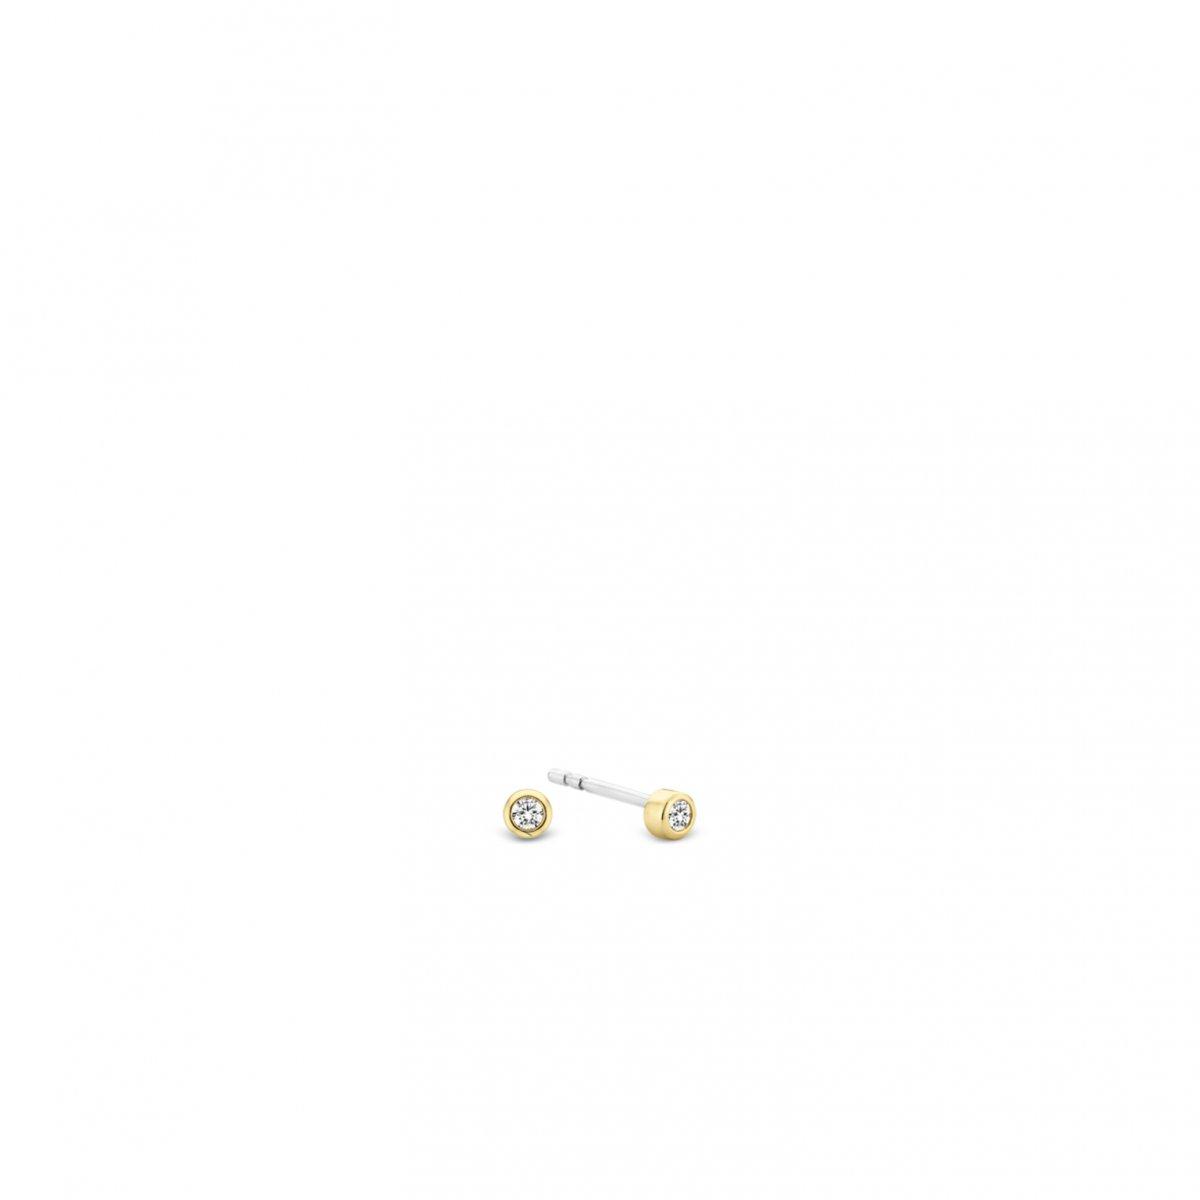 Zlaté náušnice TI SENTO so zirkónom